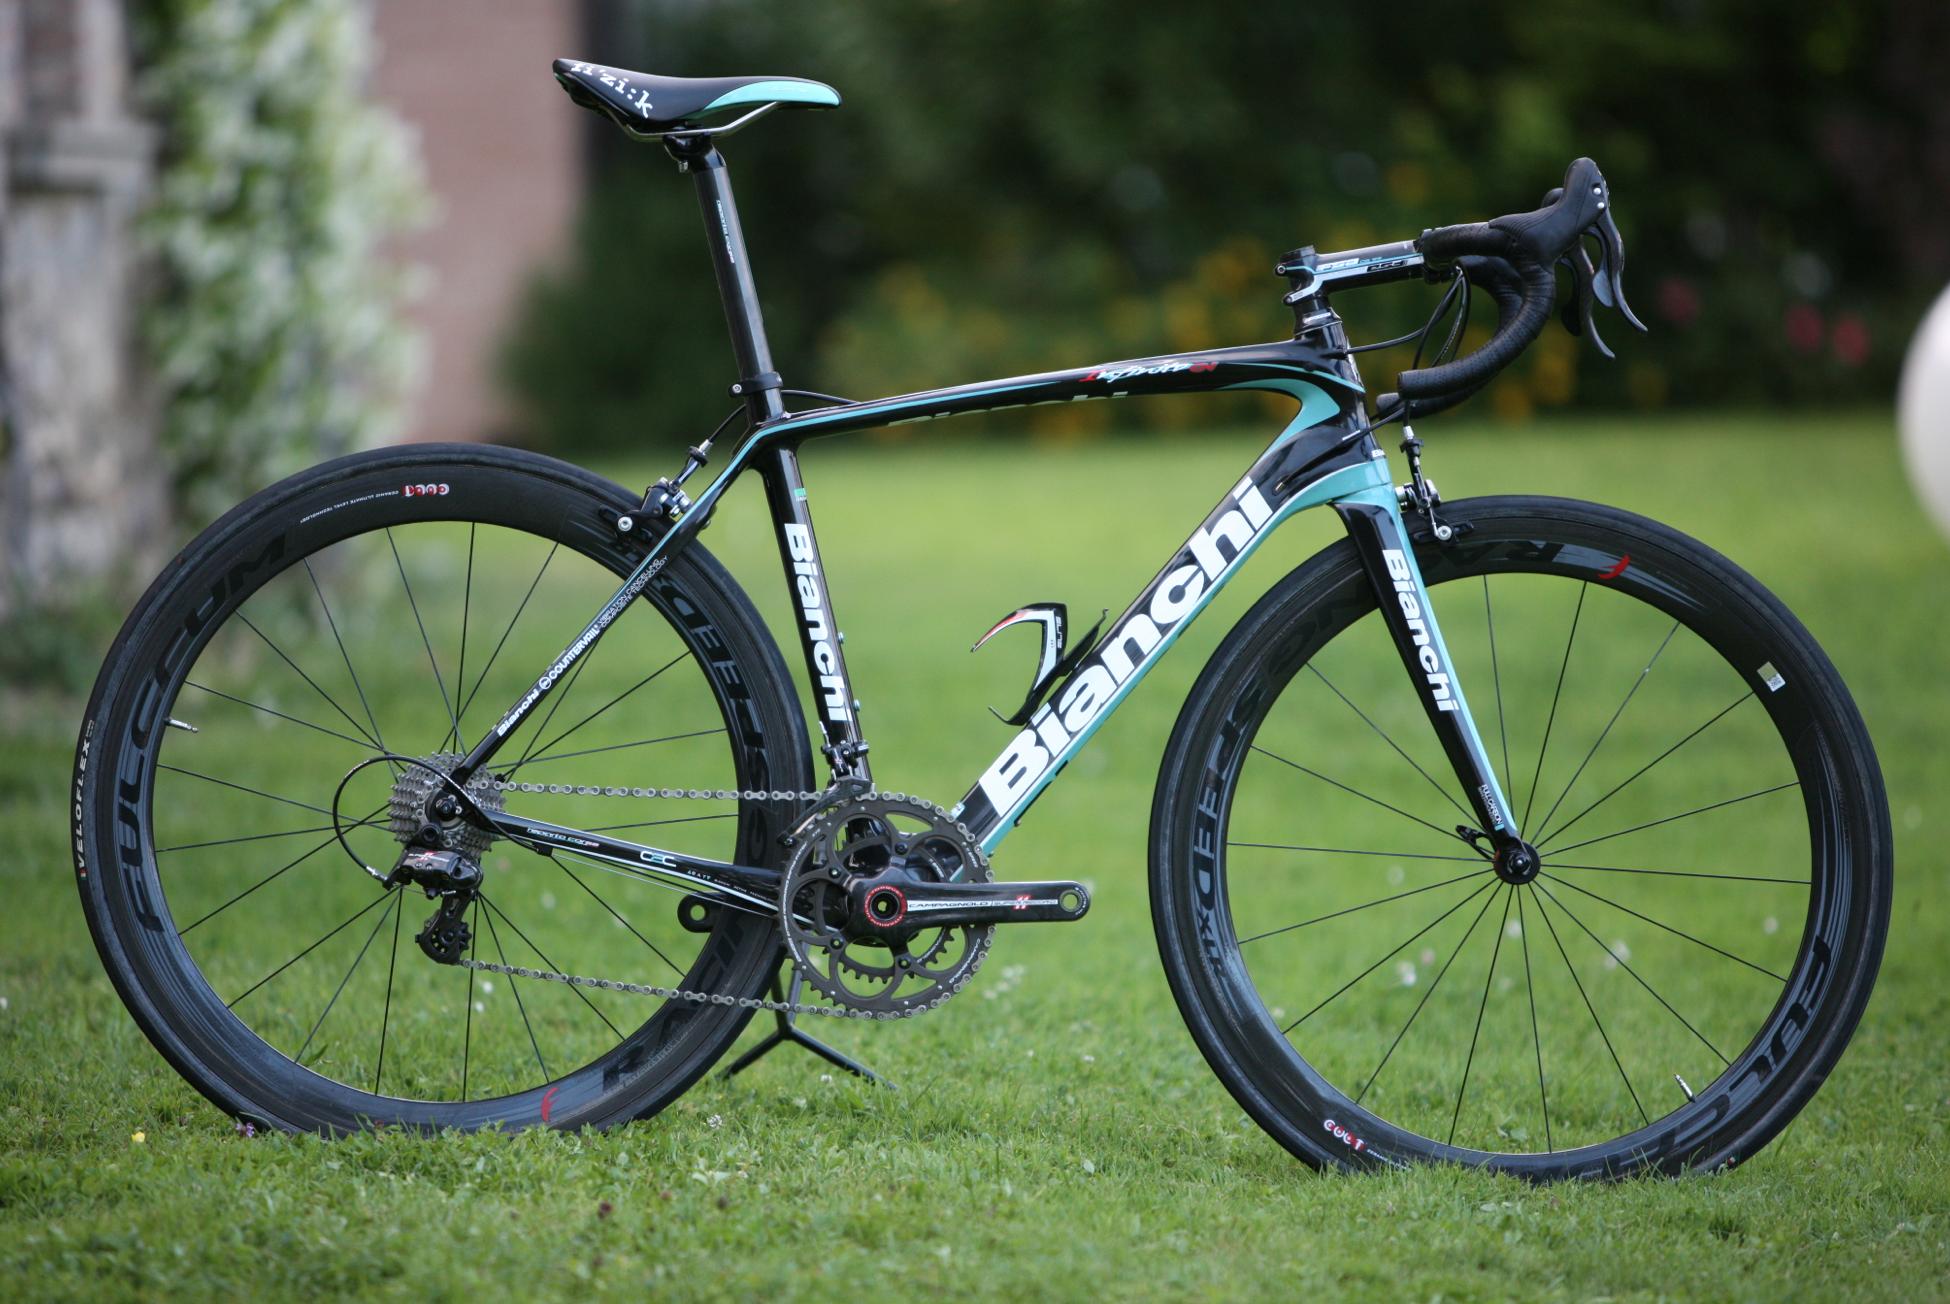 Bianchi Infinito Cv Pure Beauty Italian Bicycle Bicycle Bike Life